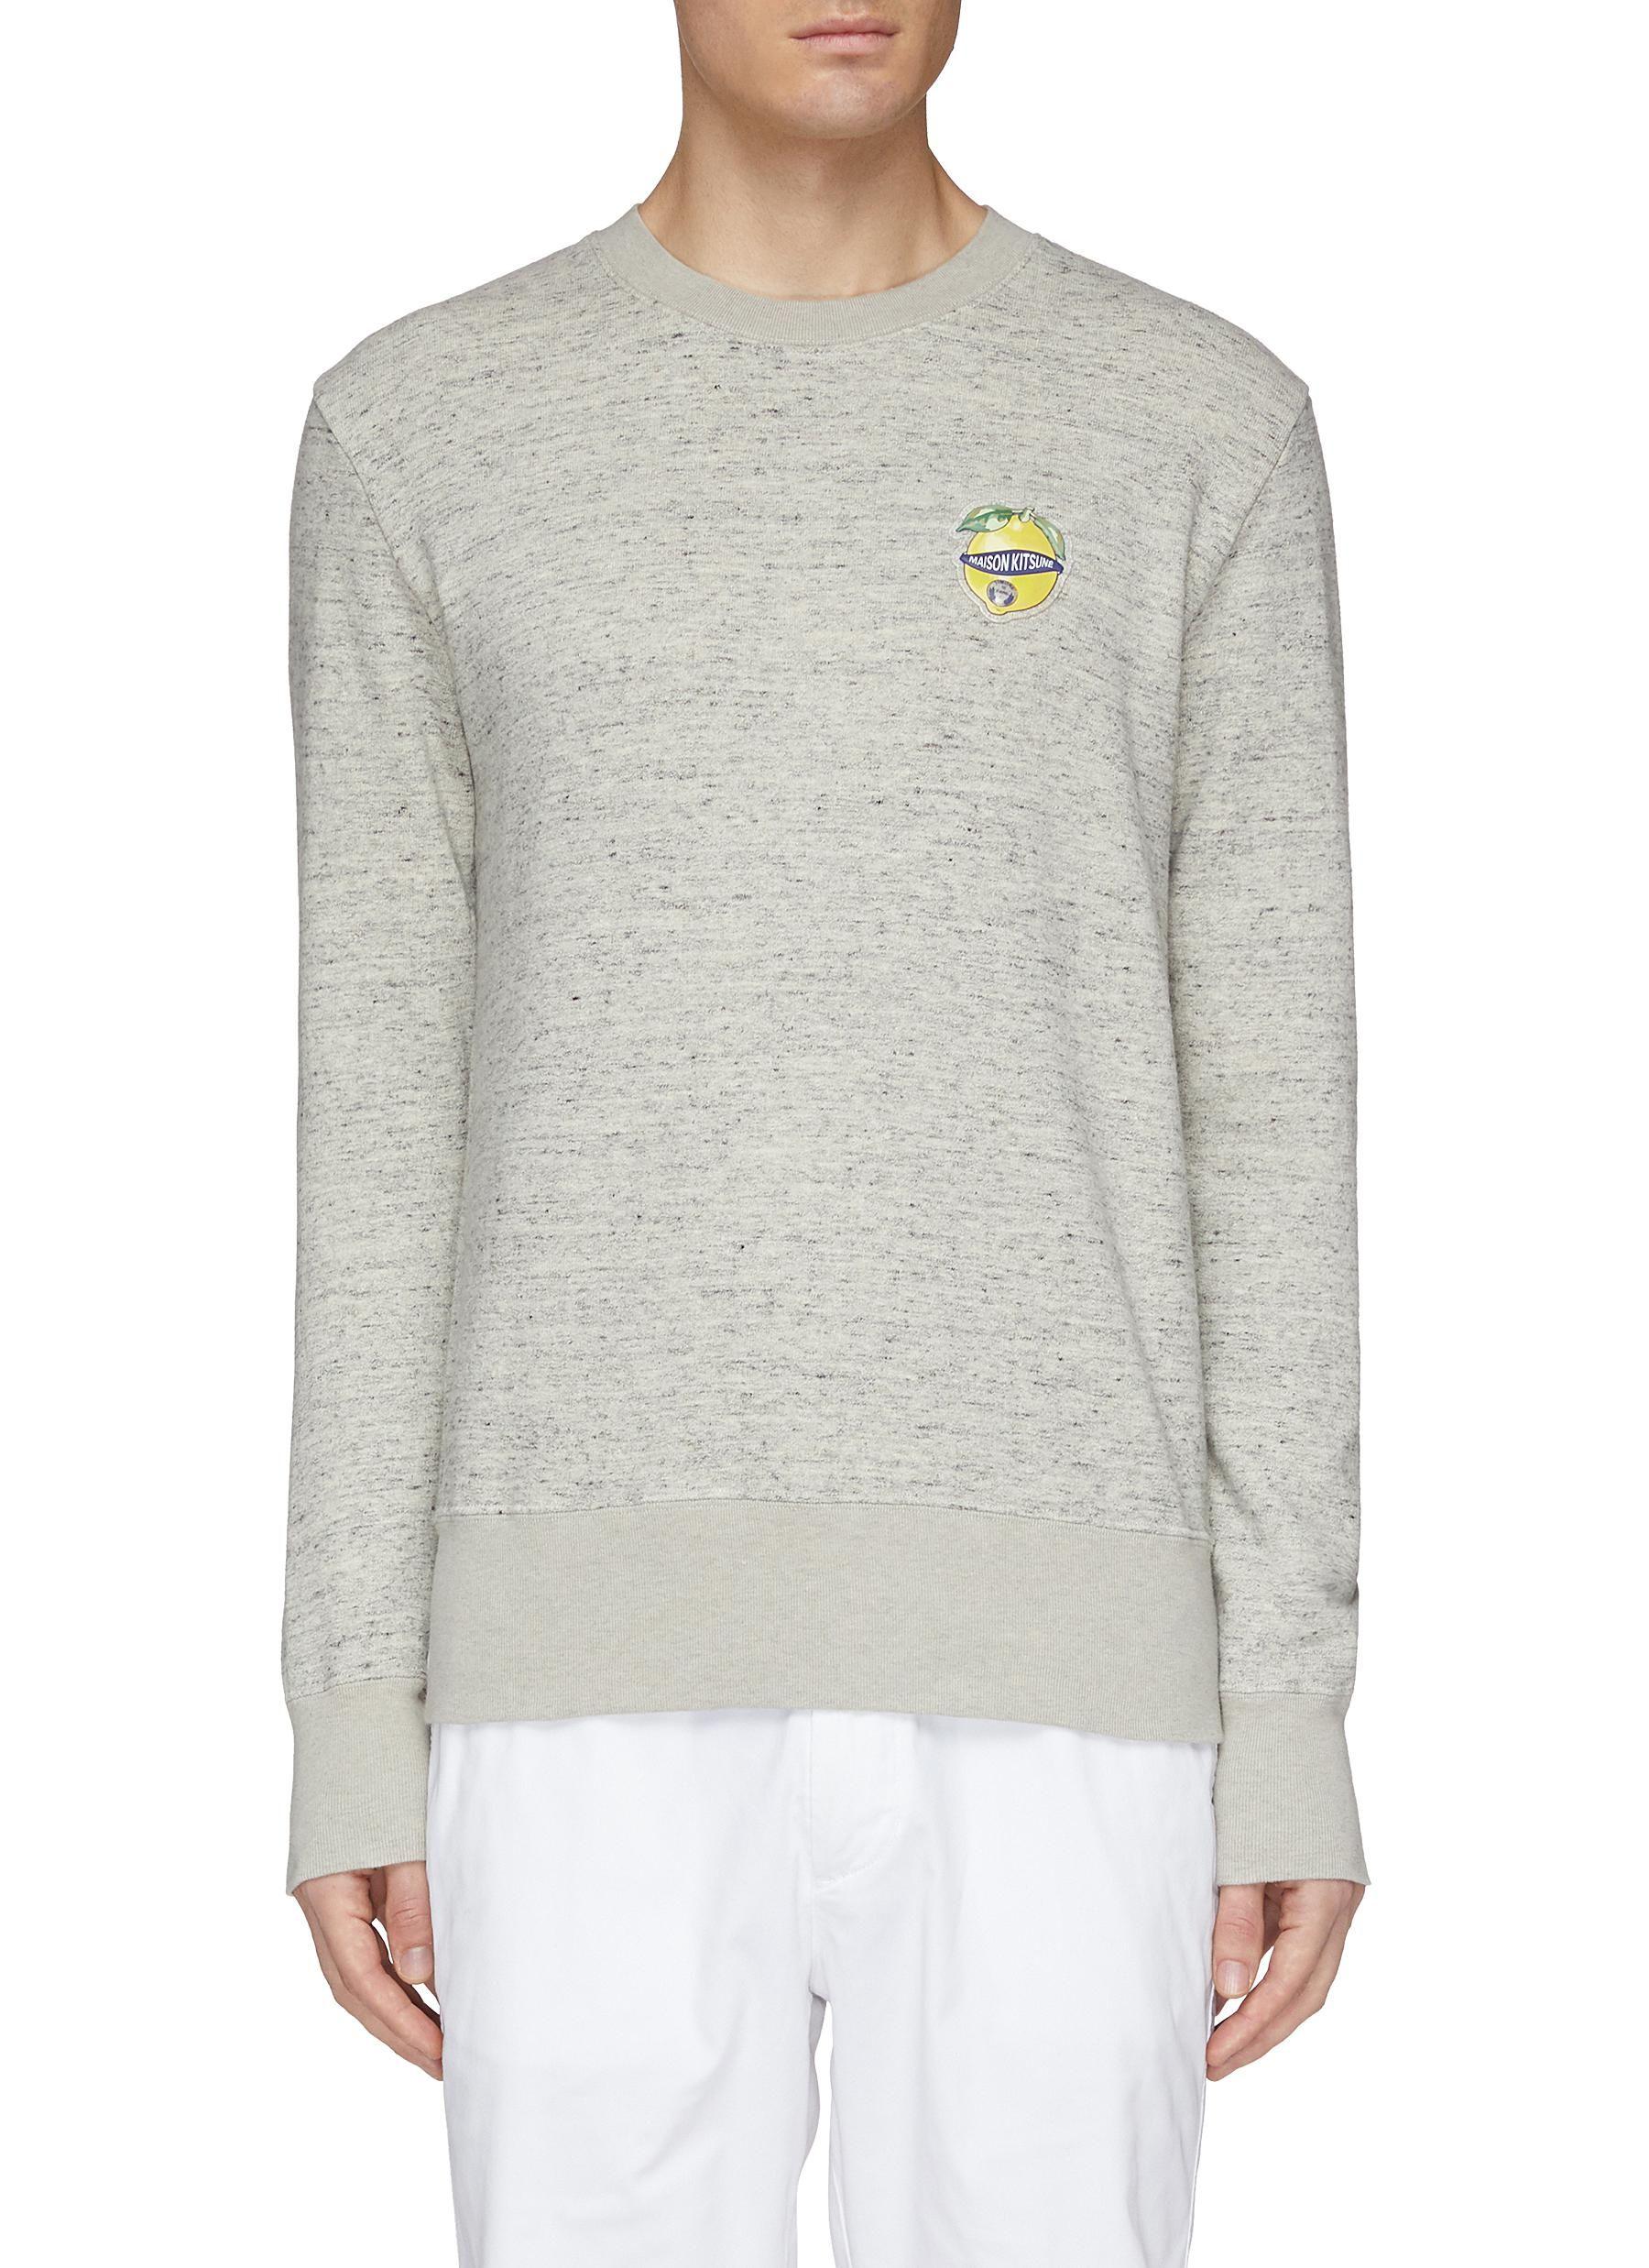 Maison Kitsune Lemon Logo Applique Cotton Linen Sweatshirt Modesens Sweatshirt Fashion Maison Kitsune Cotton Linen [ 2475 x 1800 Pixel ]